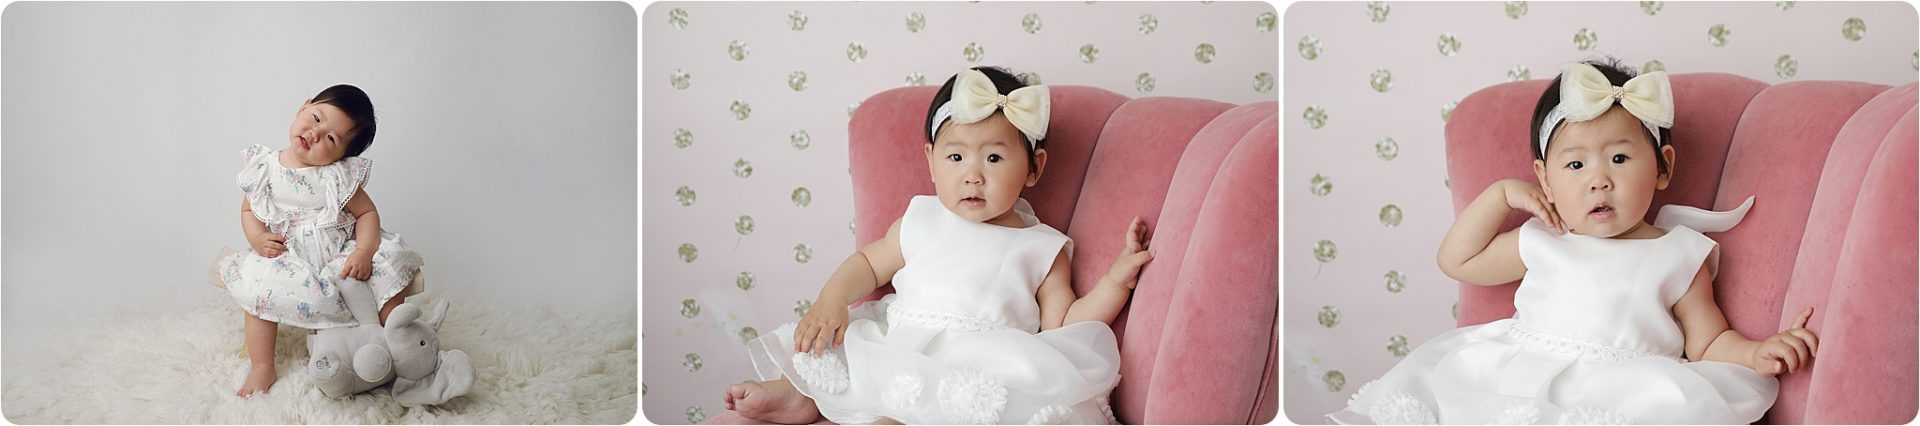 tucson baby photographer one year birthday